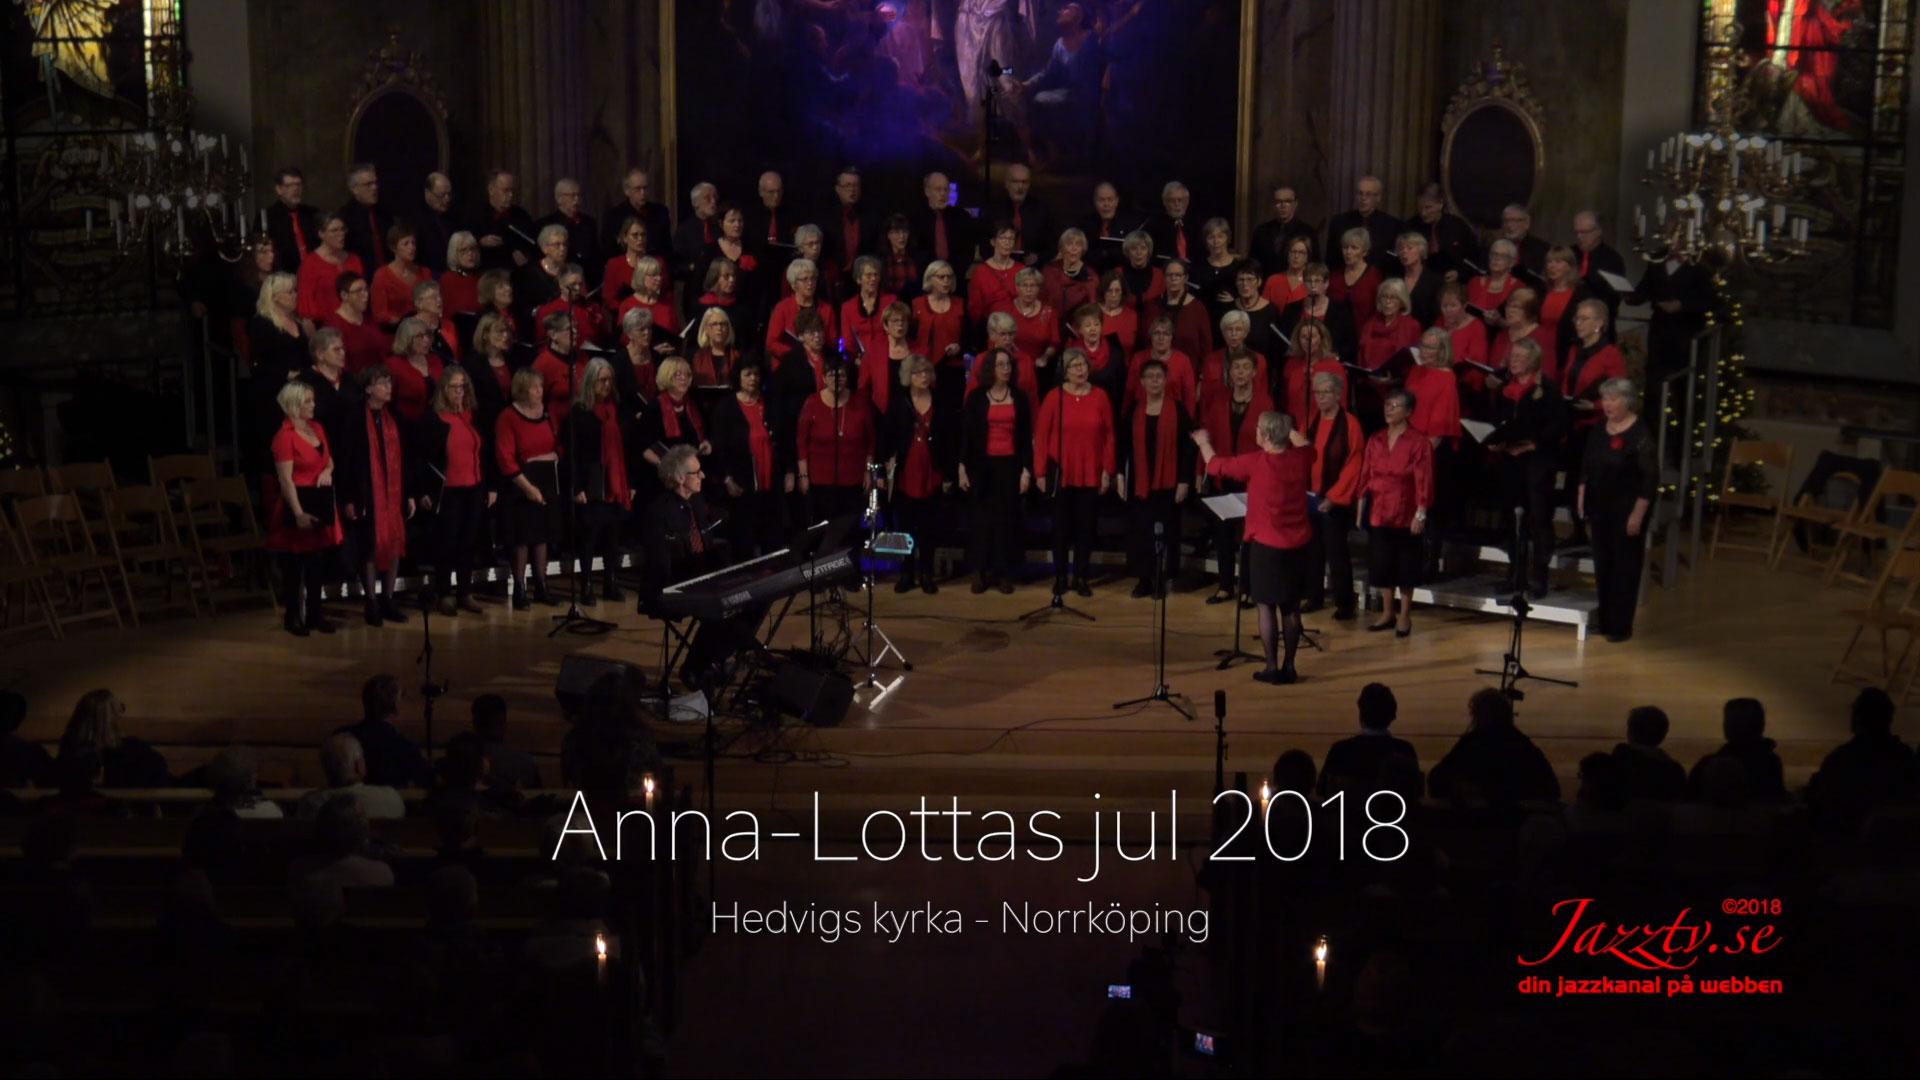 Anna-Lotta's Christmas 2018